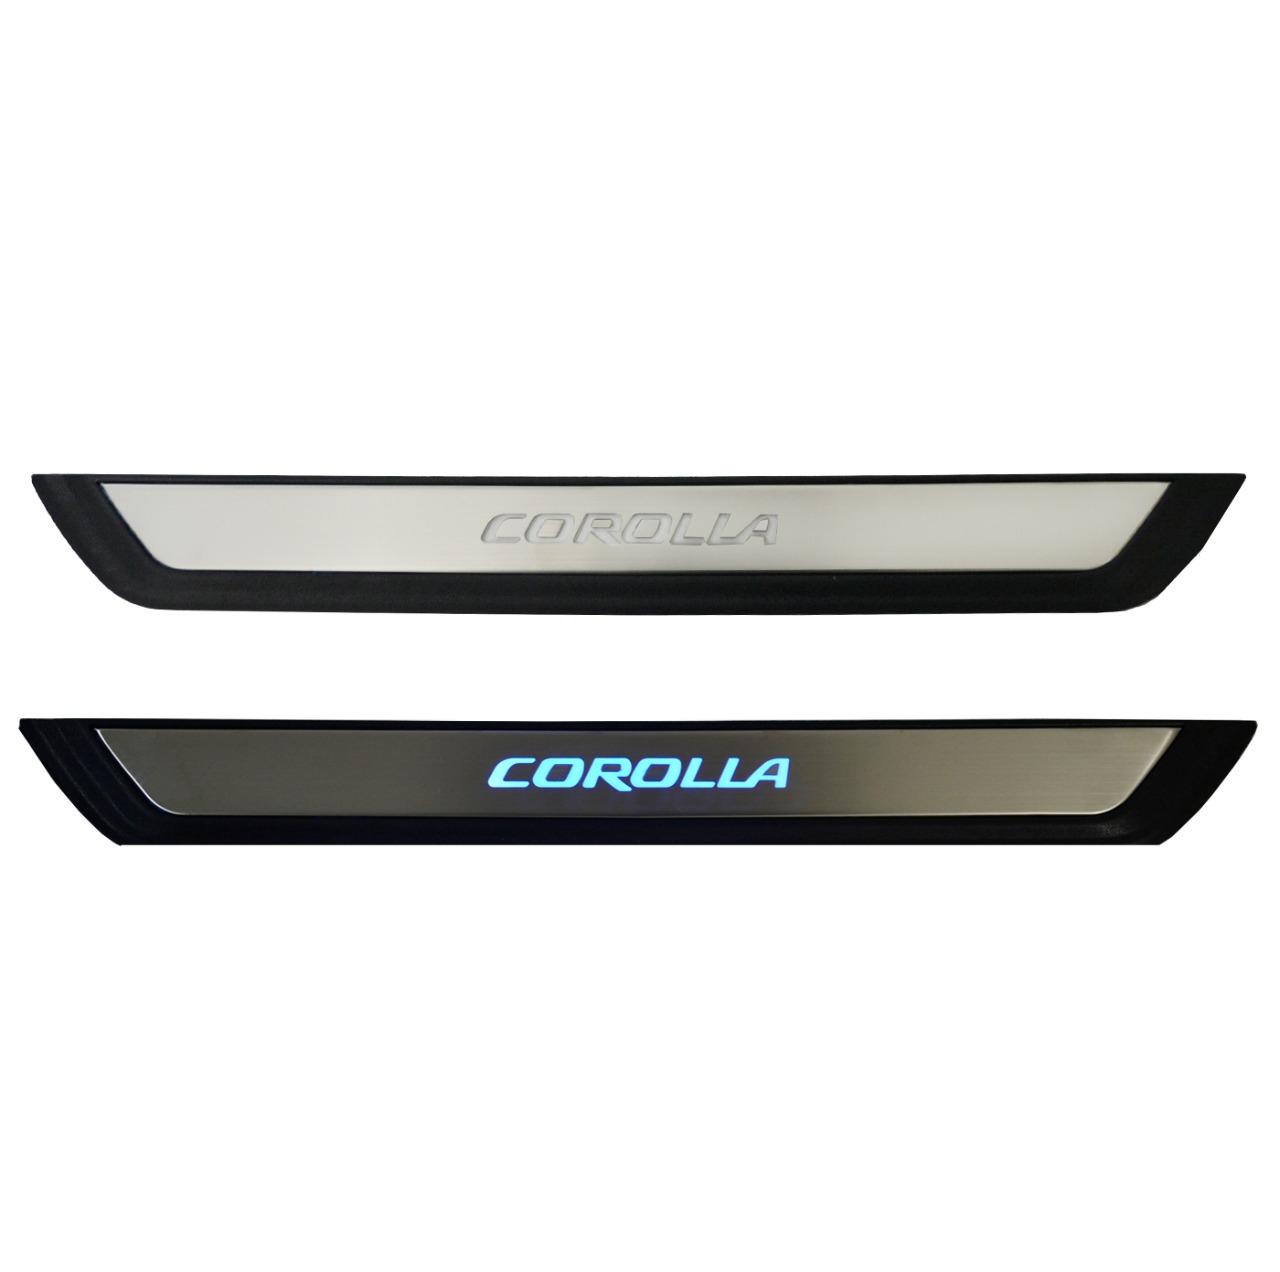 Kit Soleira de Porta C/ LED Toyota Corolla Inox Iluminada